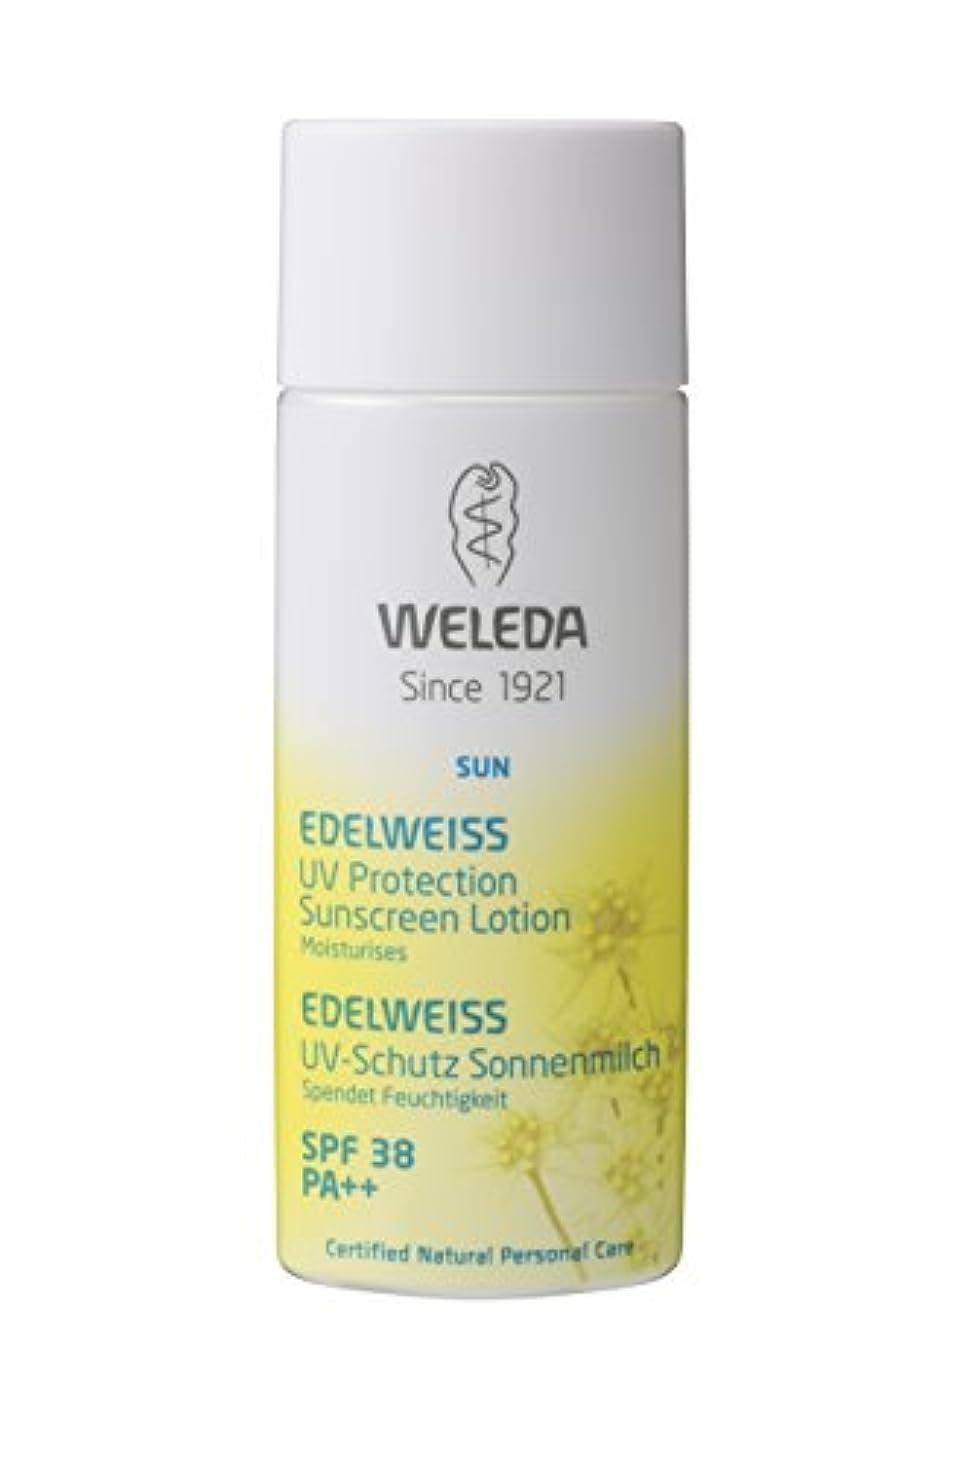 WELEDA(ヴェレダ) エーデルワイスUVプロテクト SPF38 PA++ 90ml